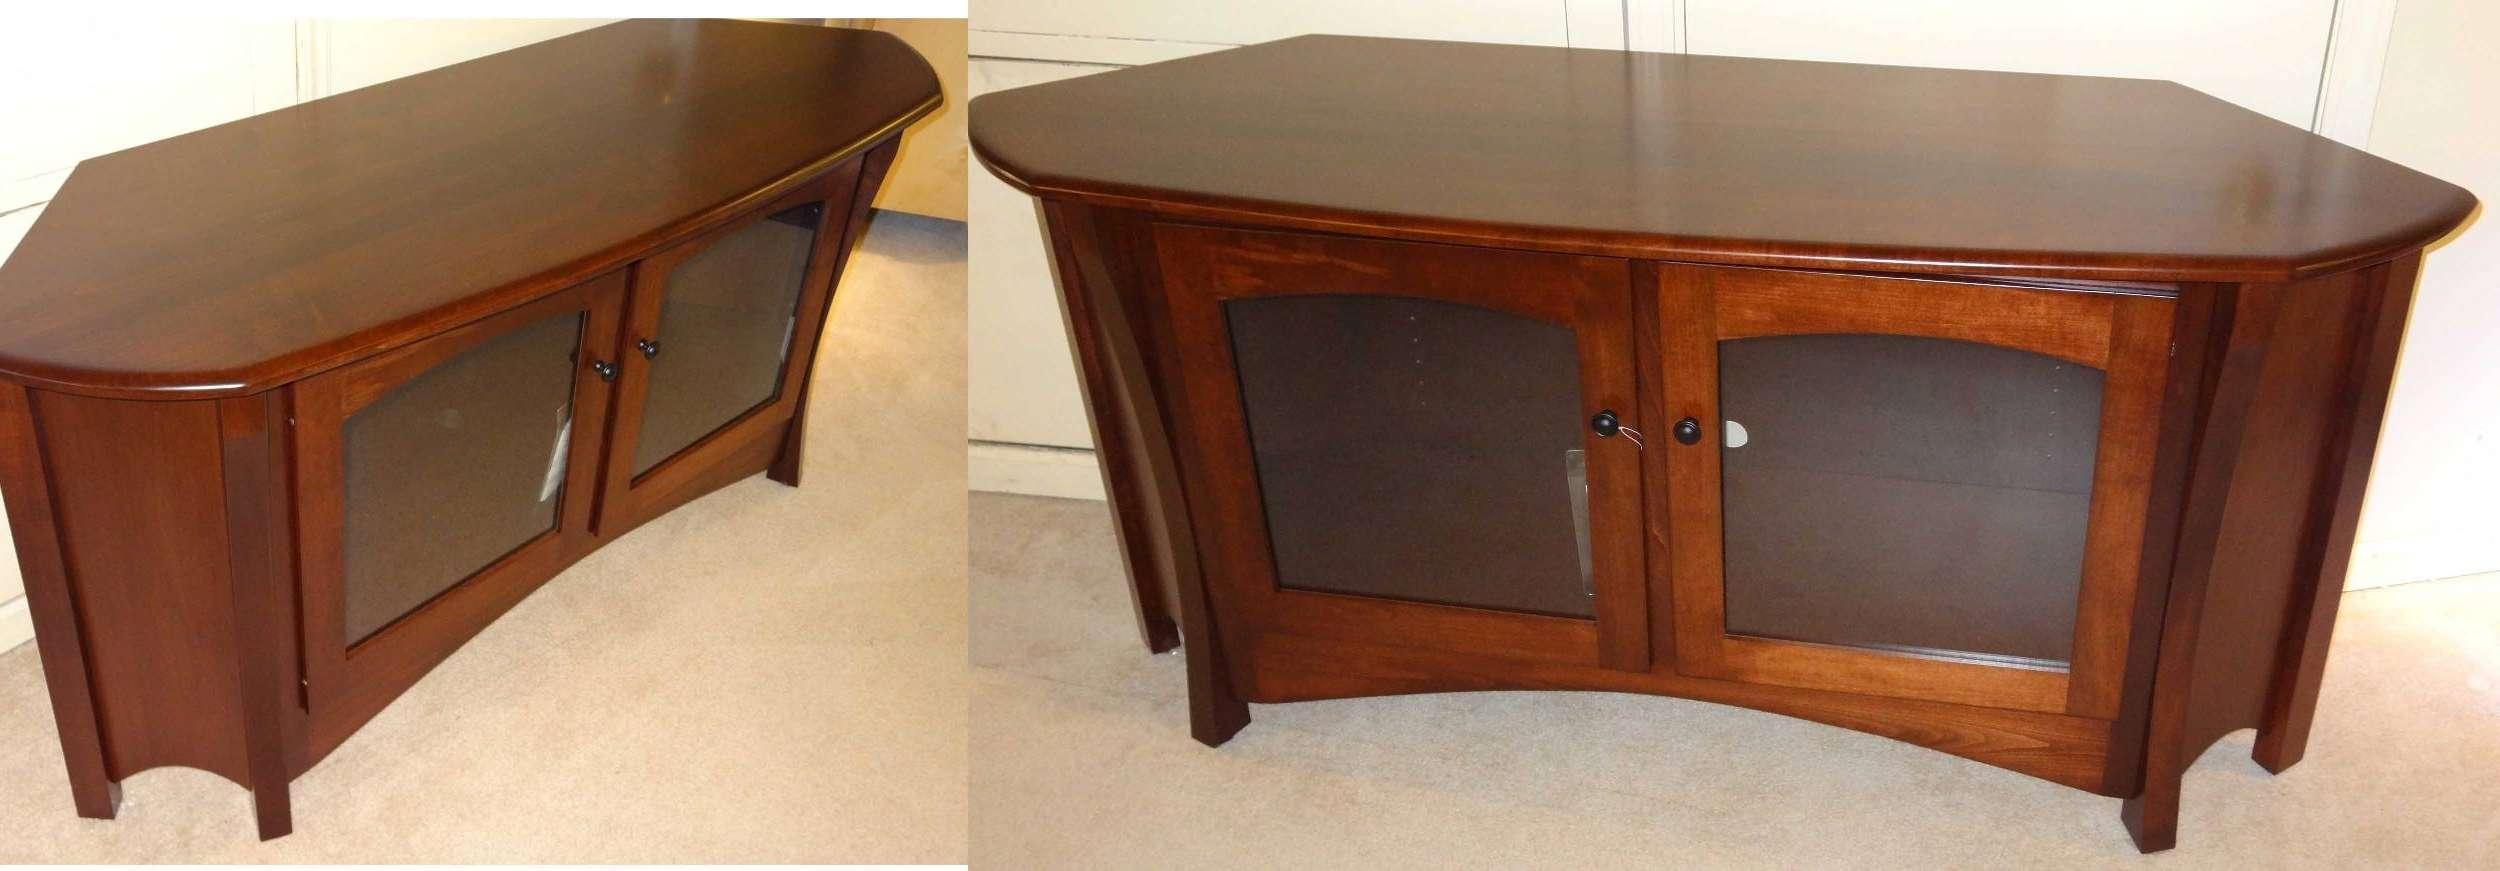 Corner Tv Cabinet Cherry Wood • Corner Cabinets With Cherry Wood Tv Cabinets (View 7 of 20)